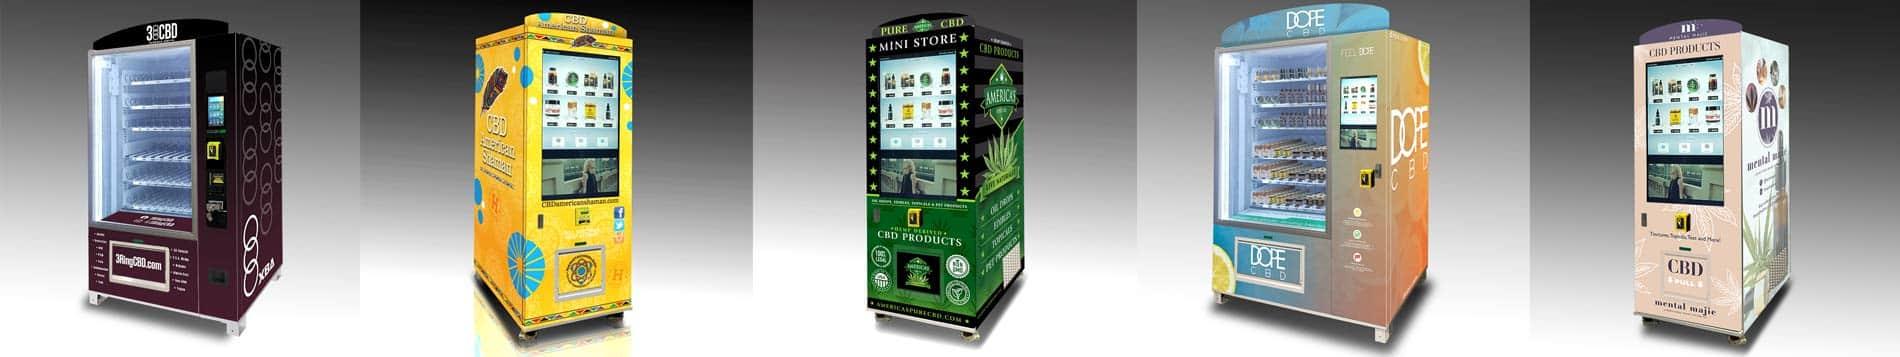 Gallery of custom CBD vending machines